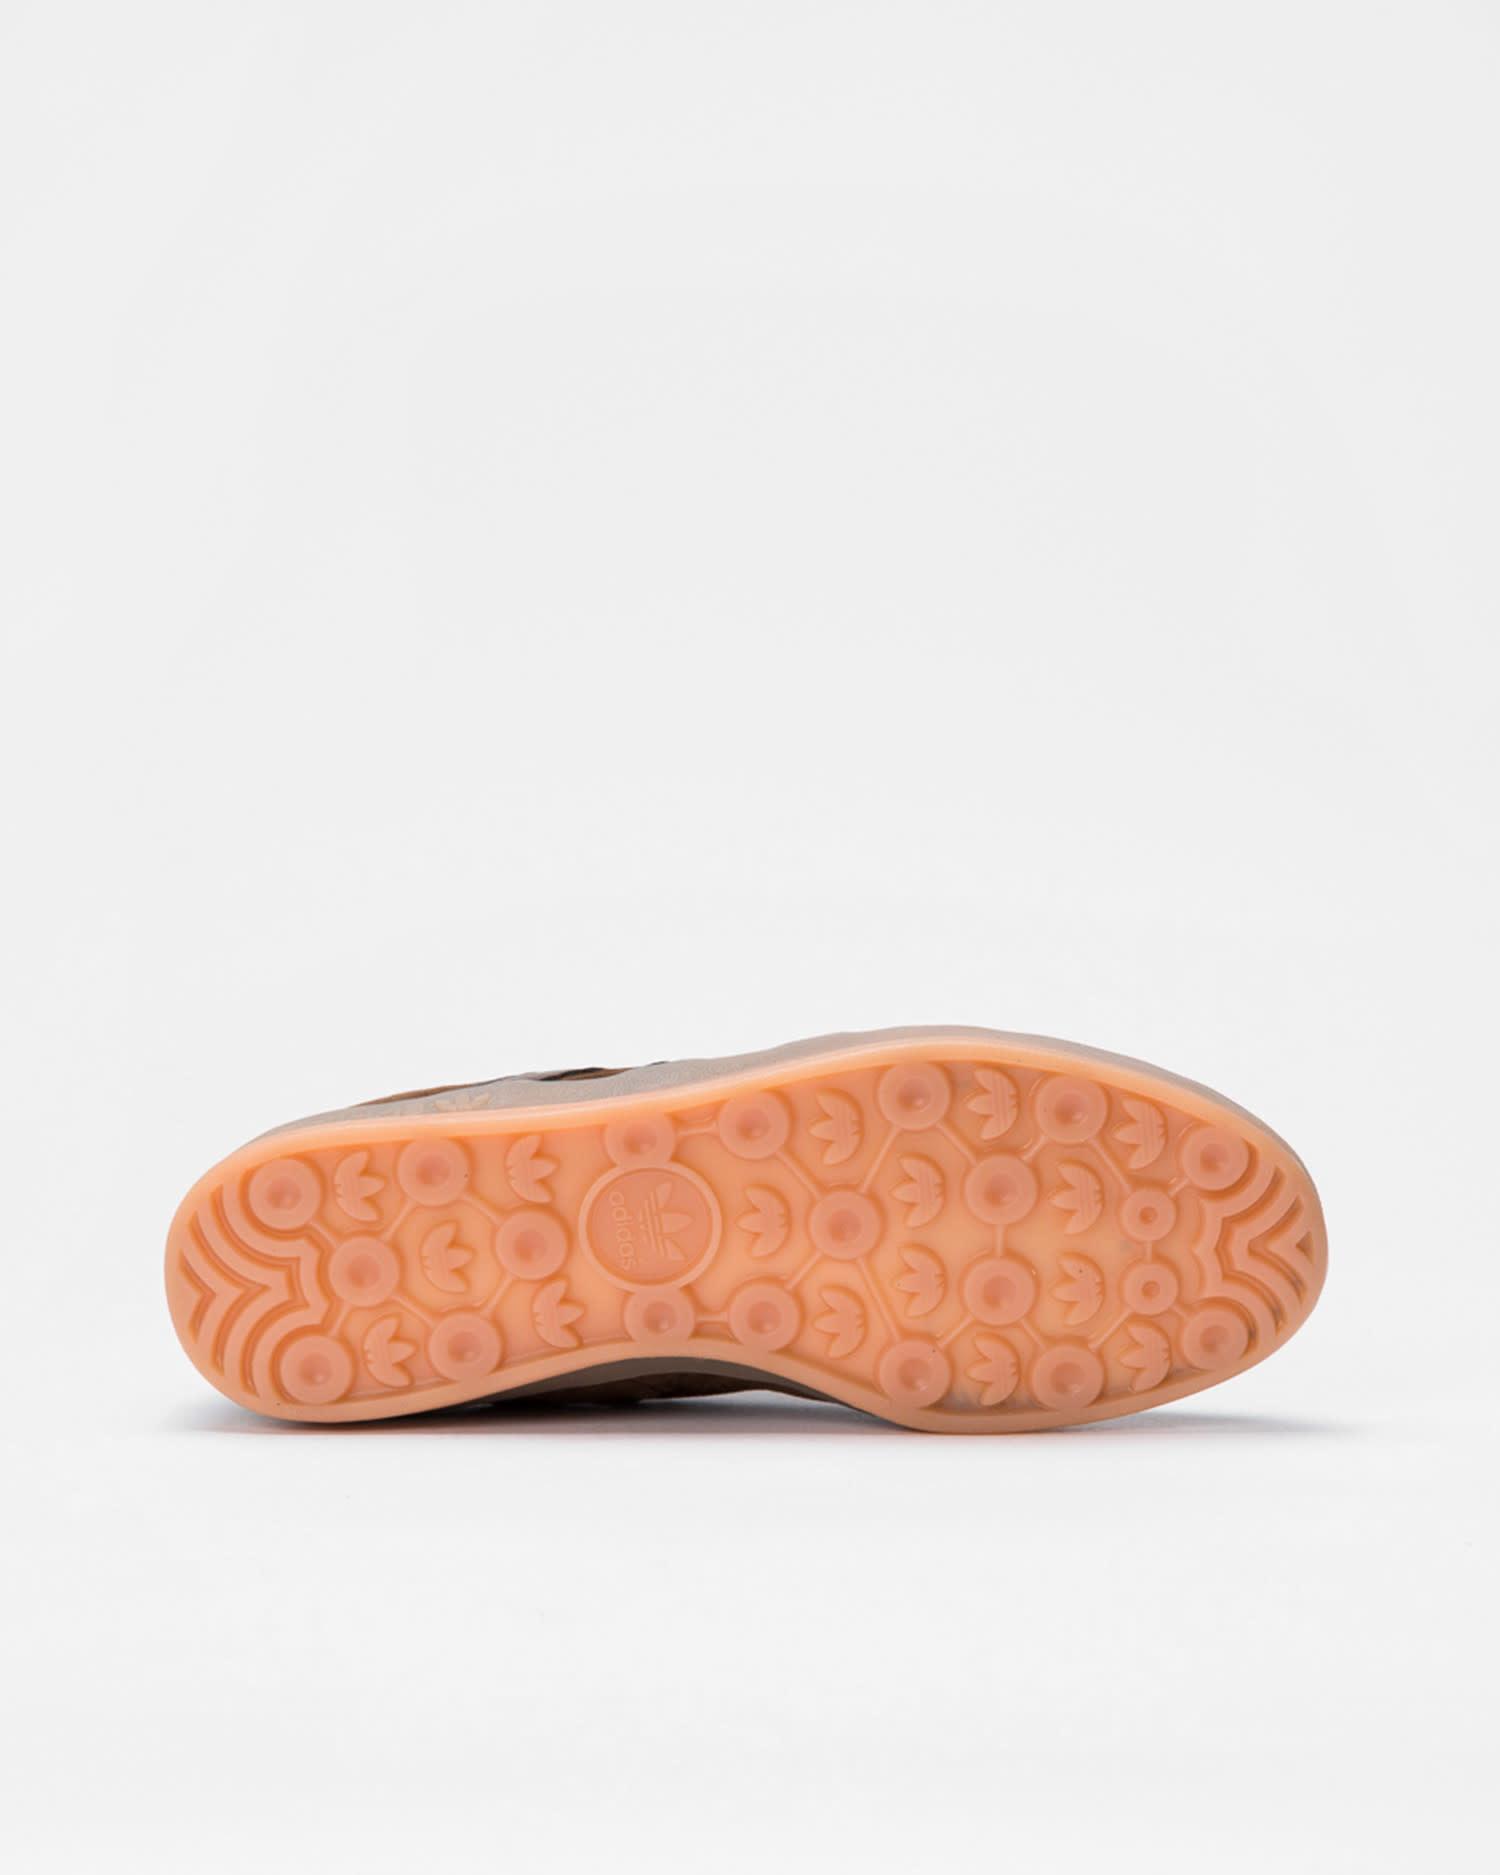 Adidas Aloha Super Stbark/Stbark/Vappink